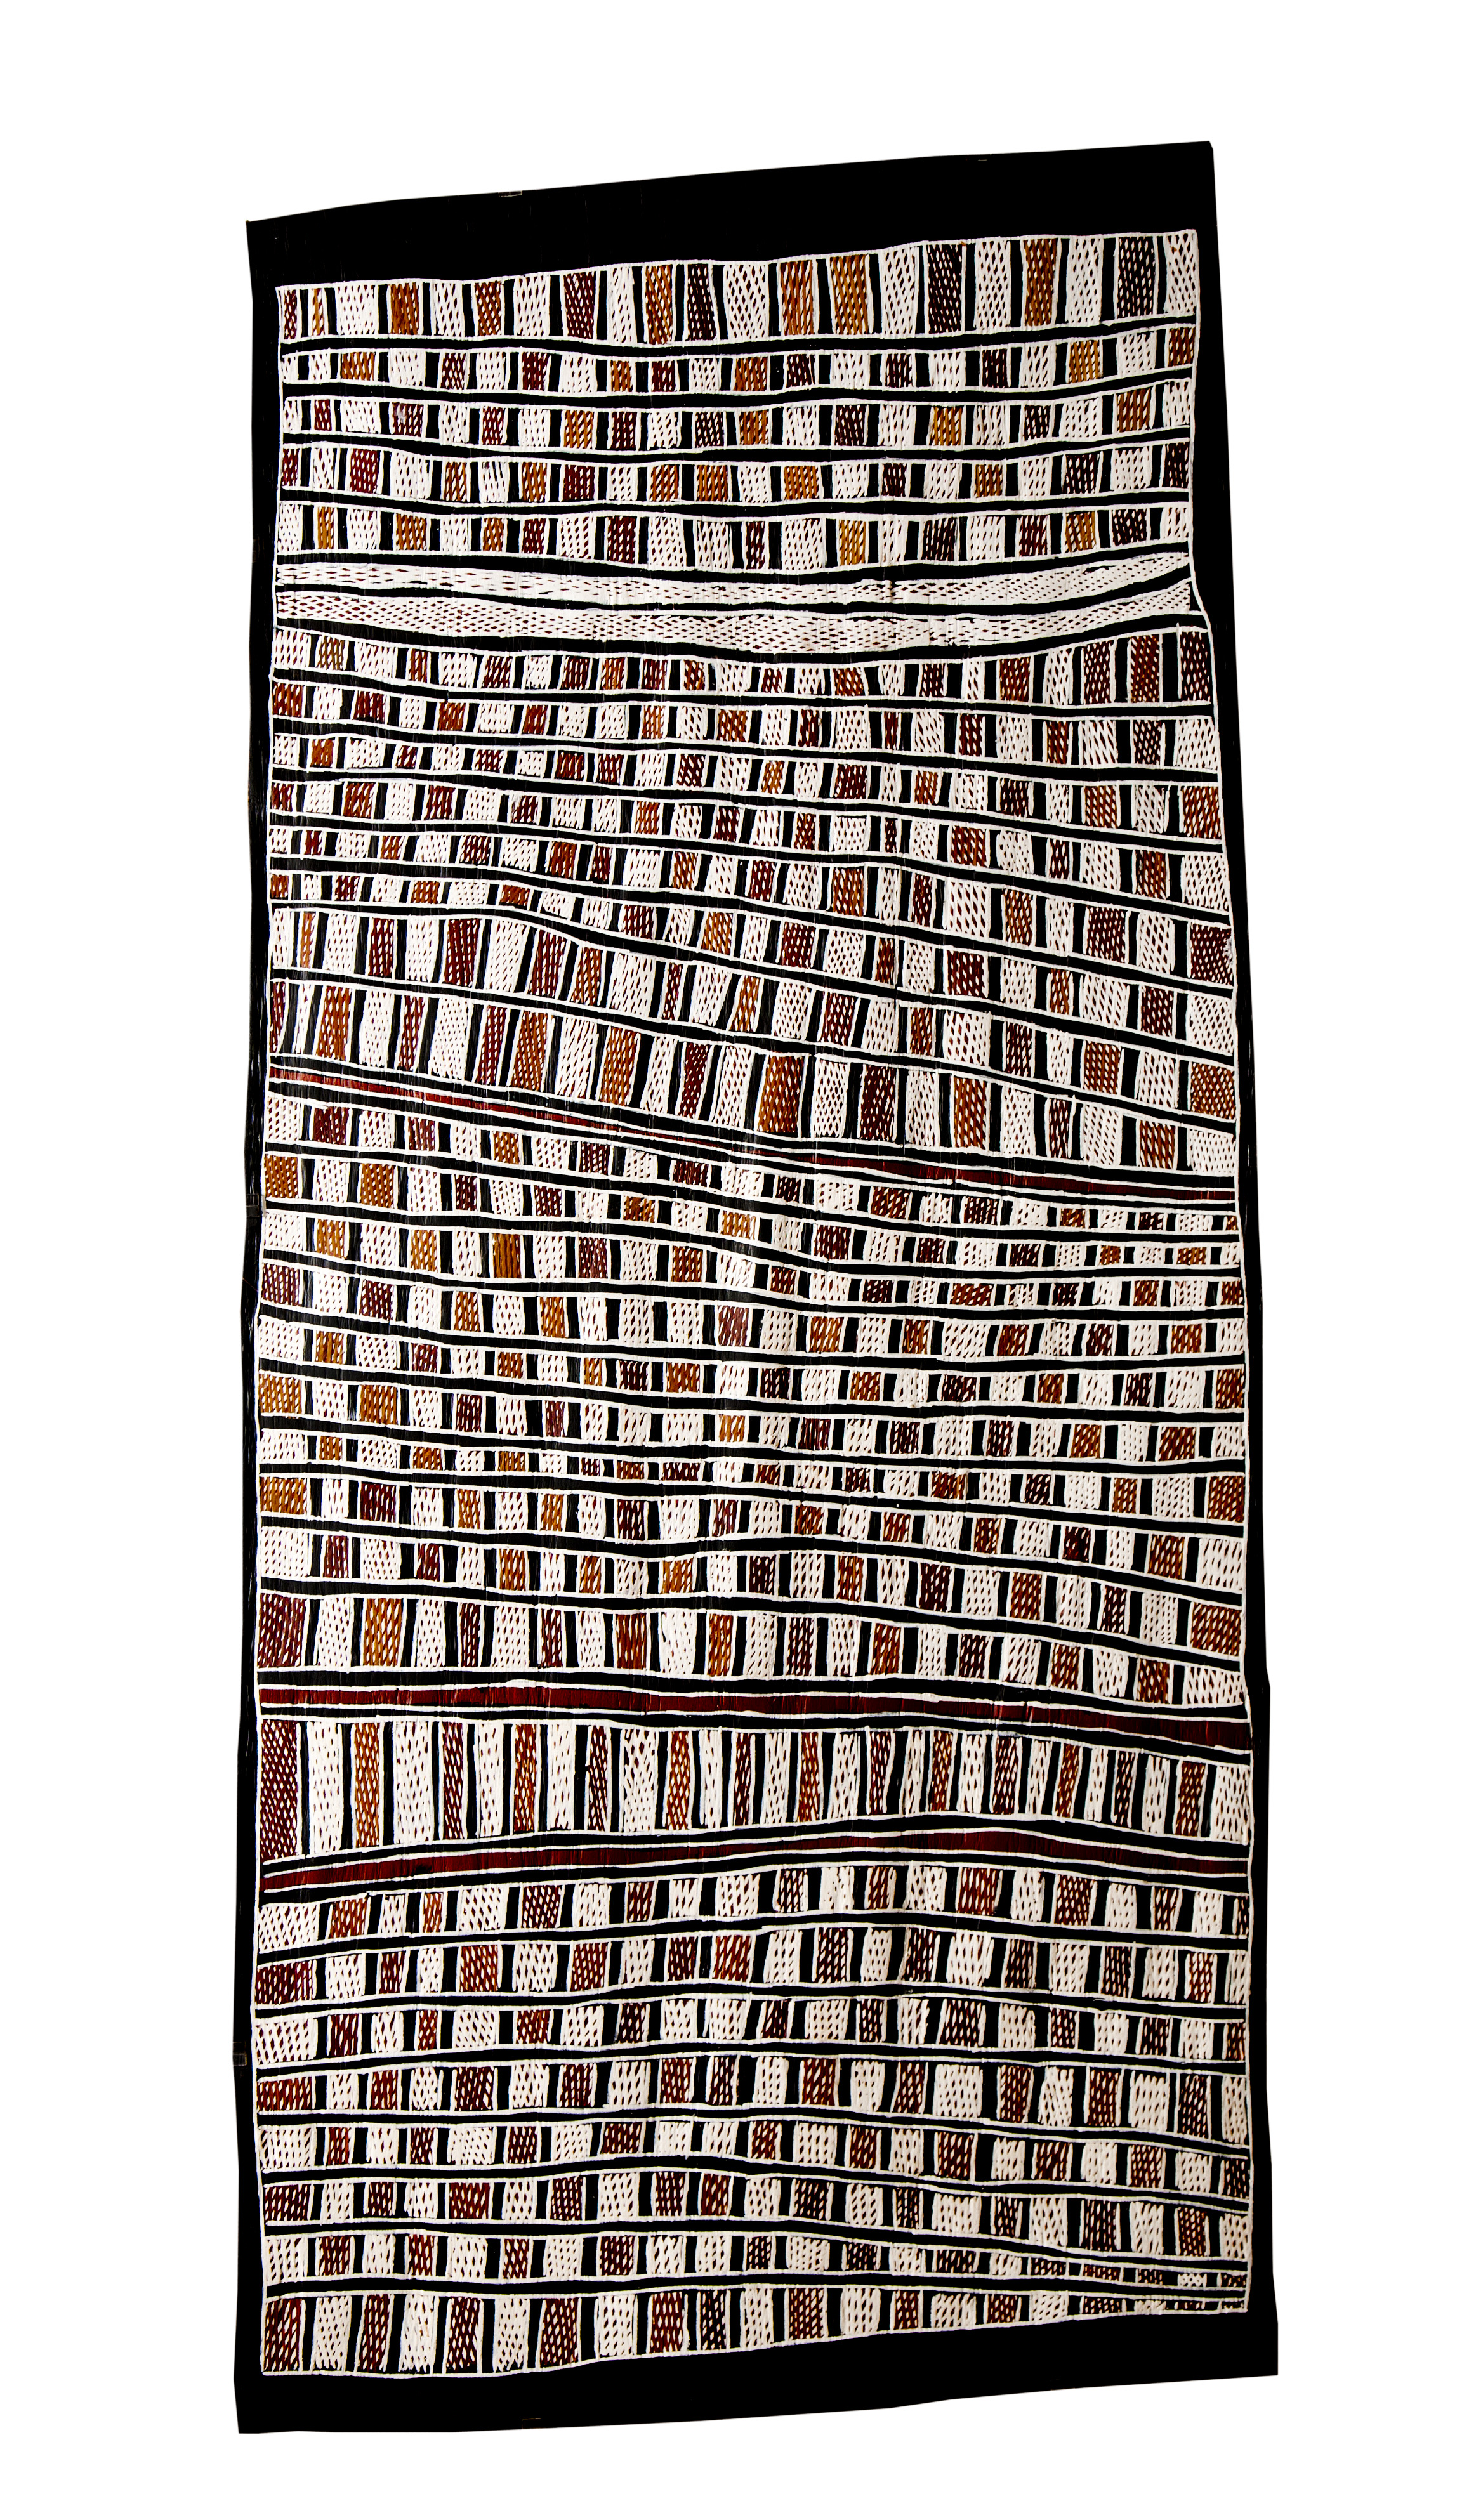 Nongirrnga Marawili  Fish Traps  Natural earth pigments on bark 167 x 79cm Buku Larrnggay Mulka #3118O   EMAIL INQUIRY